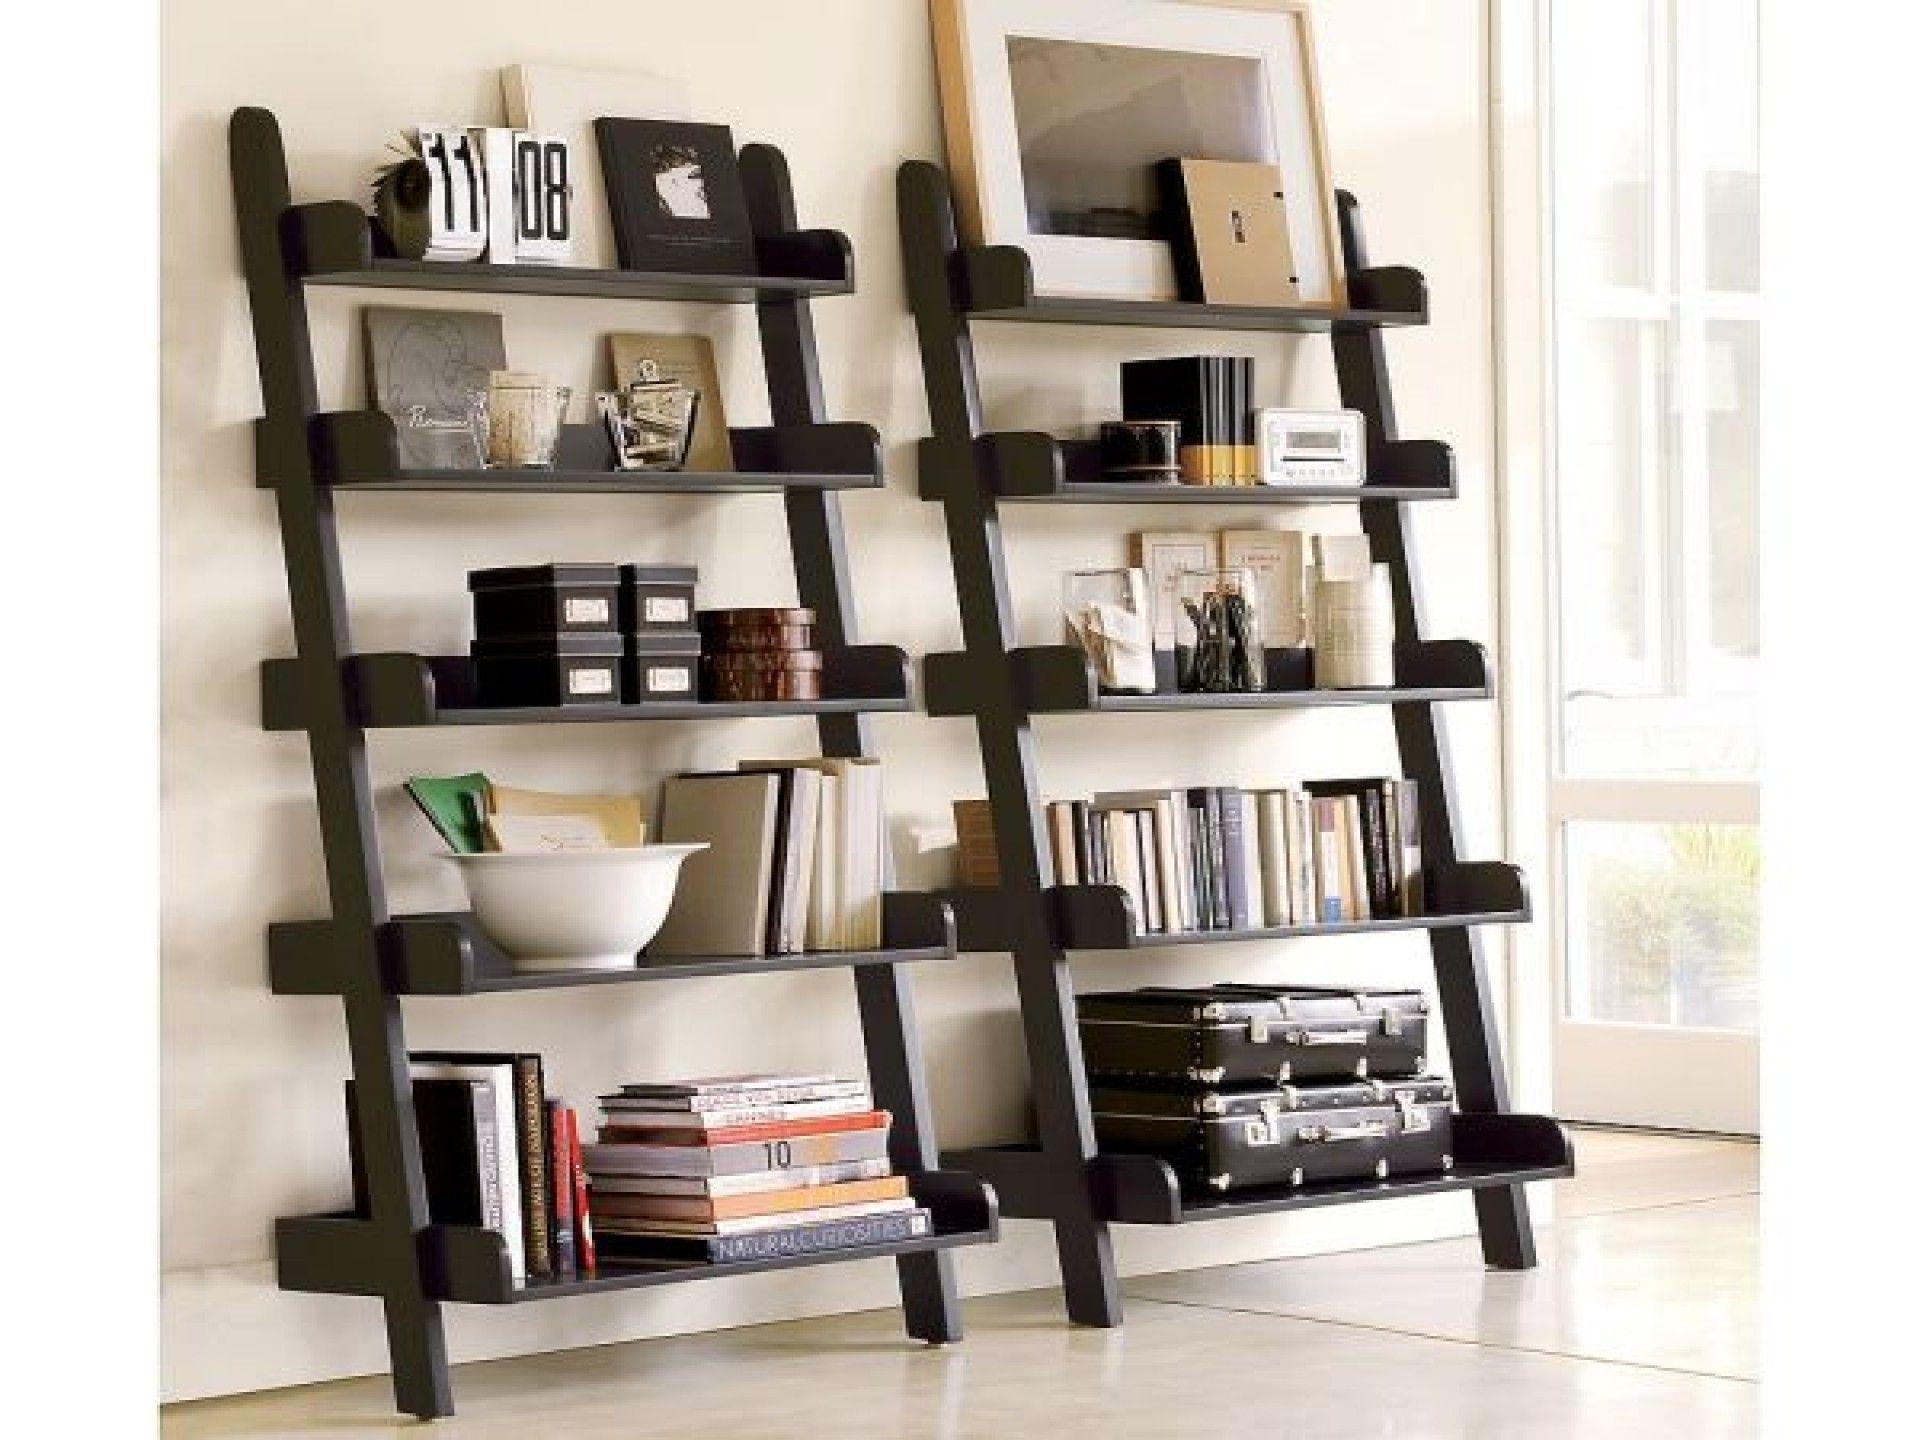 Studio Wall Shelf Bookcase From Pottery Barn